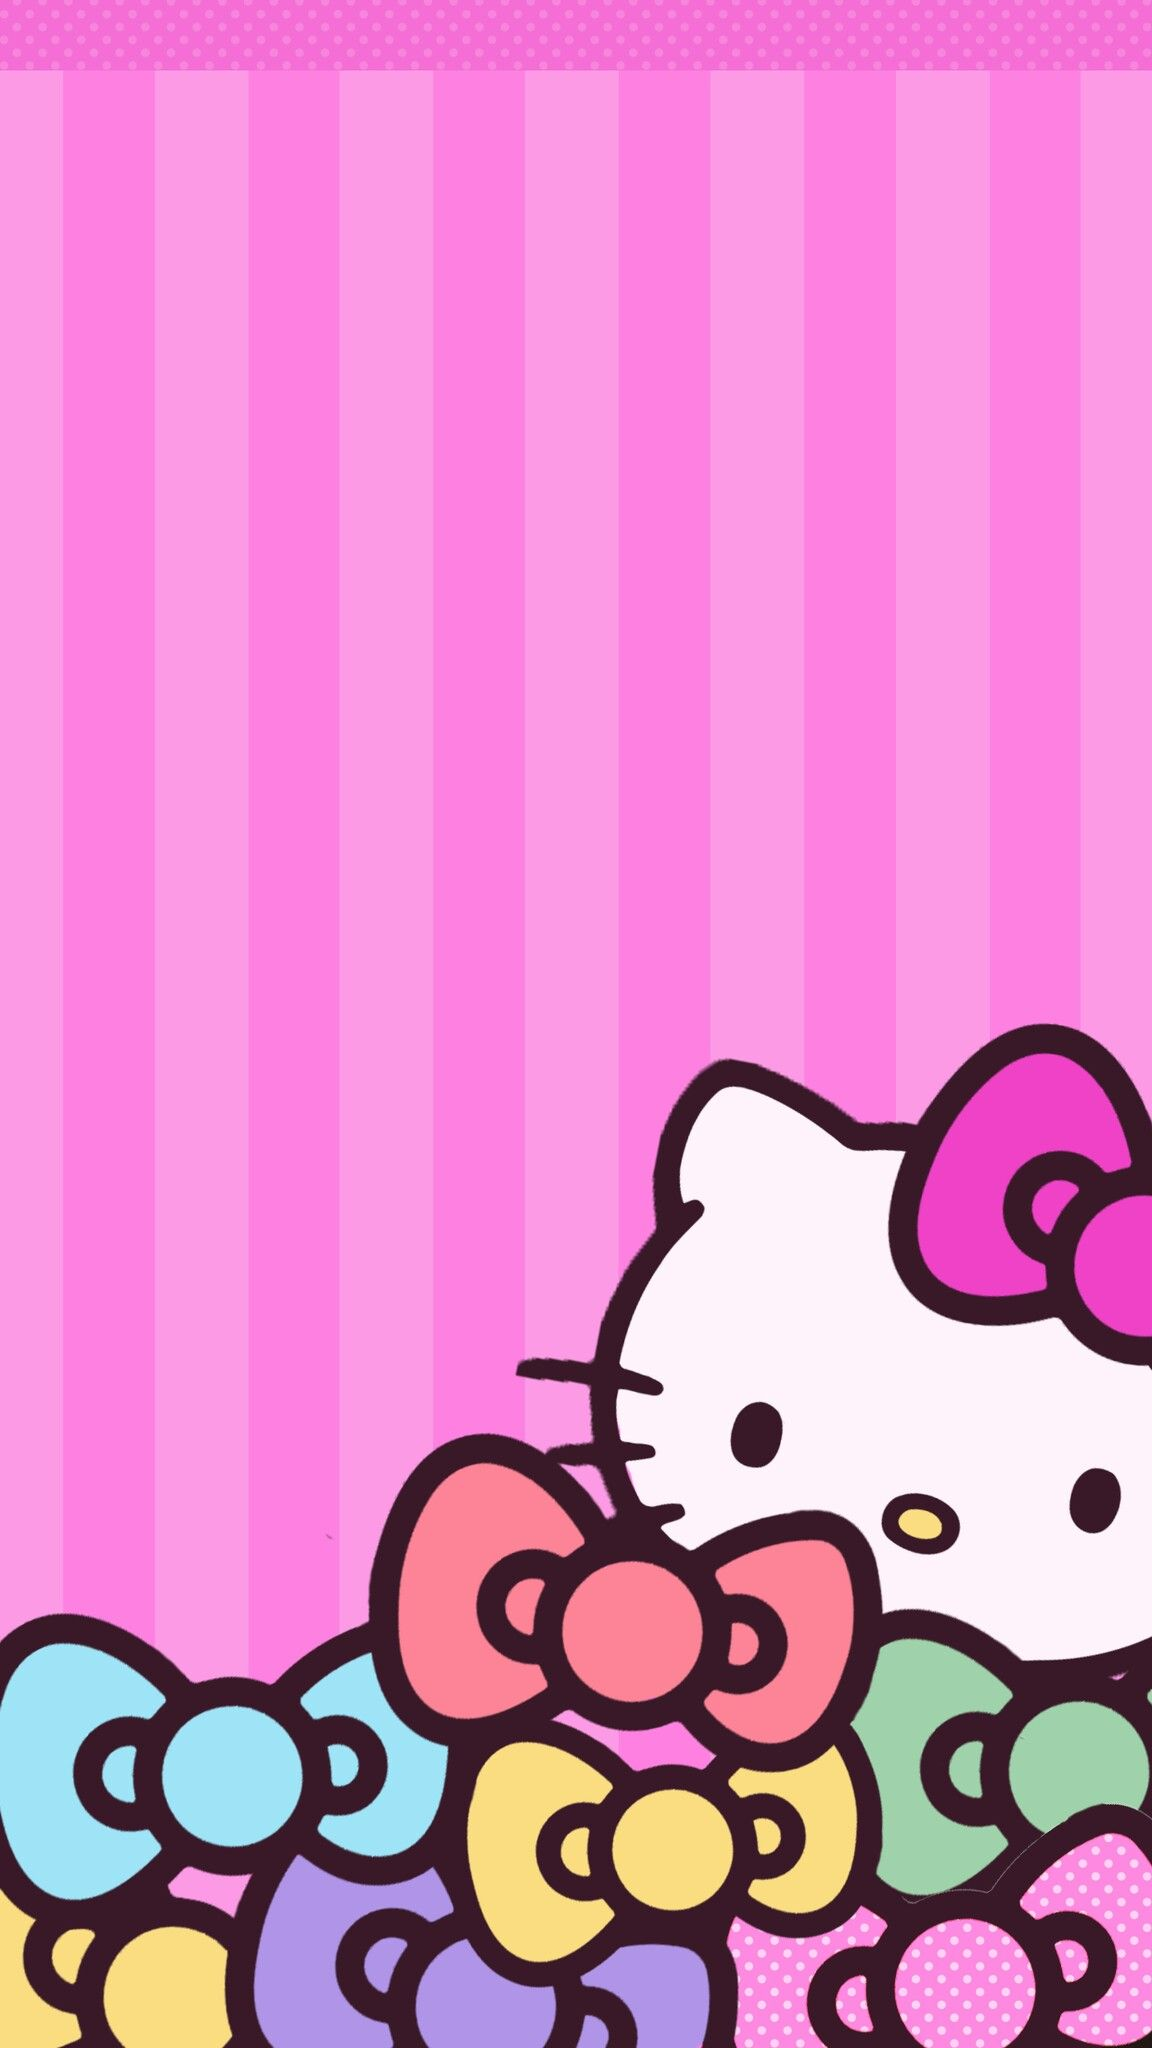 Popular Wallpaper Hello Kitty Design - f712e8cafe832d7ac35c2f2918b54b4b  Image_539094.jpg